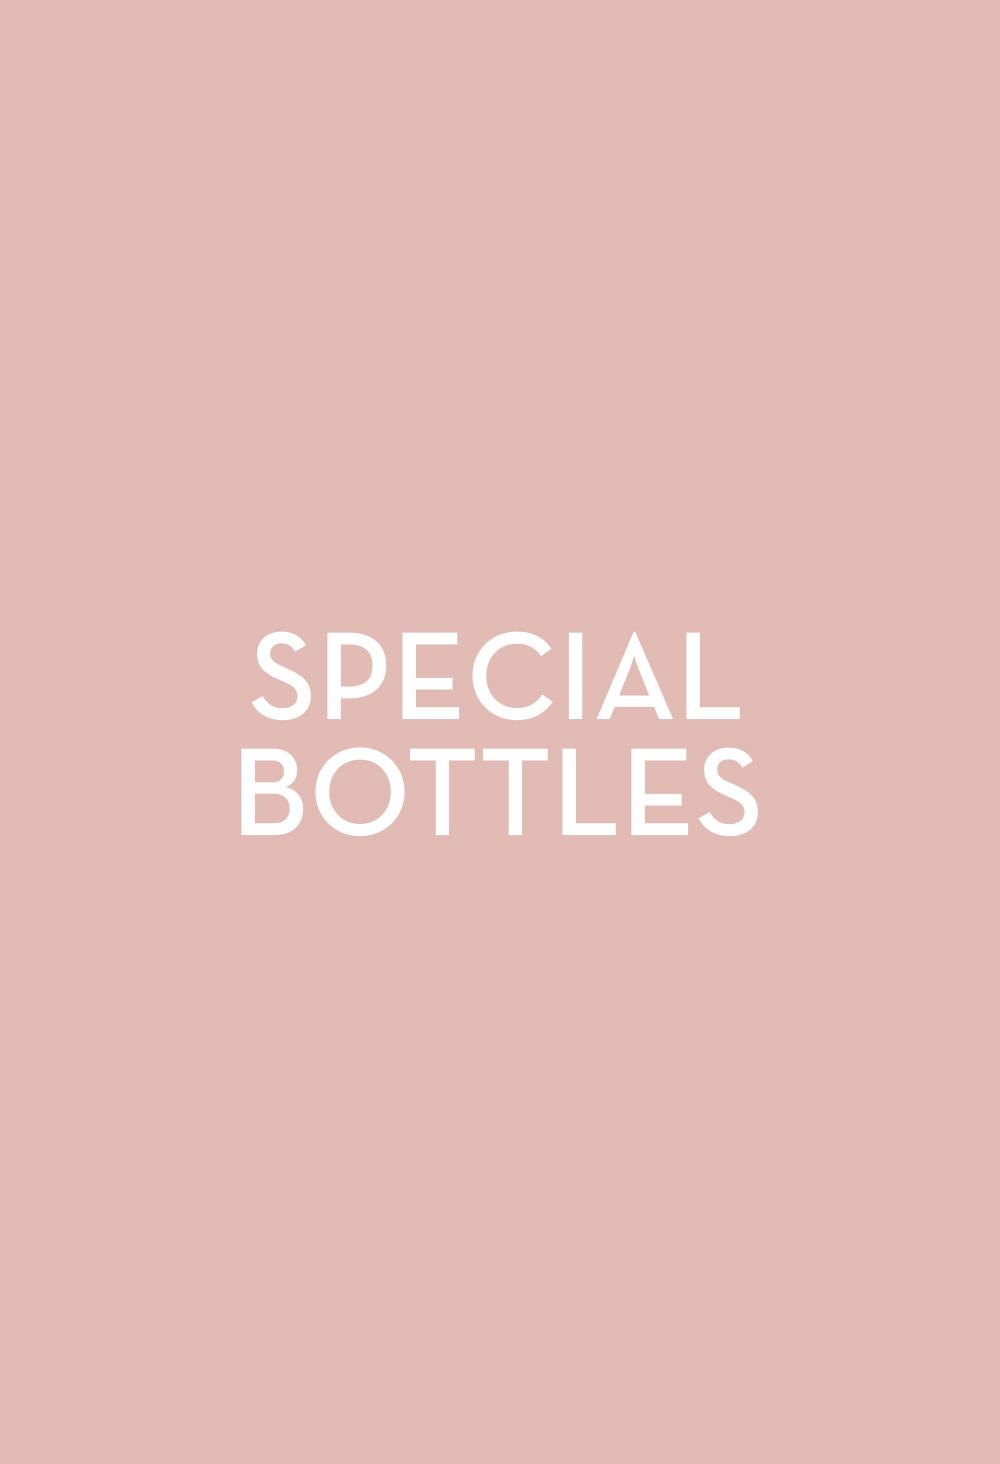 Special Bottles - Fasten